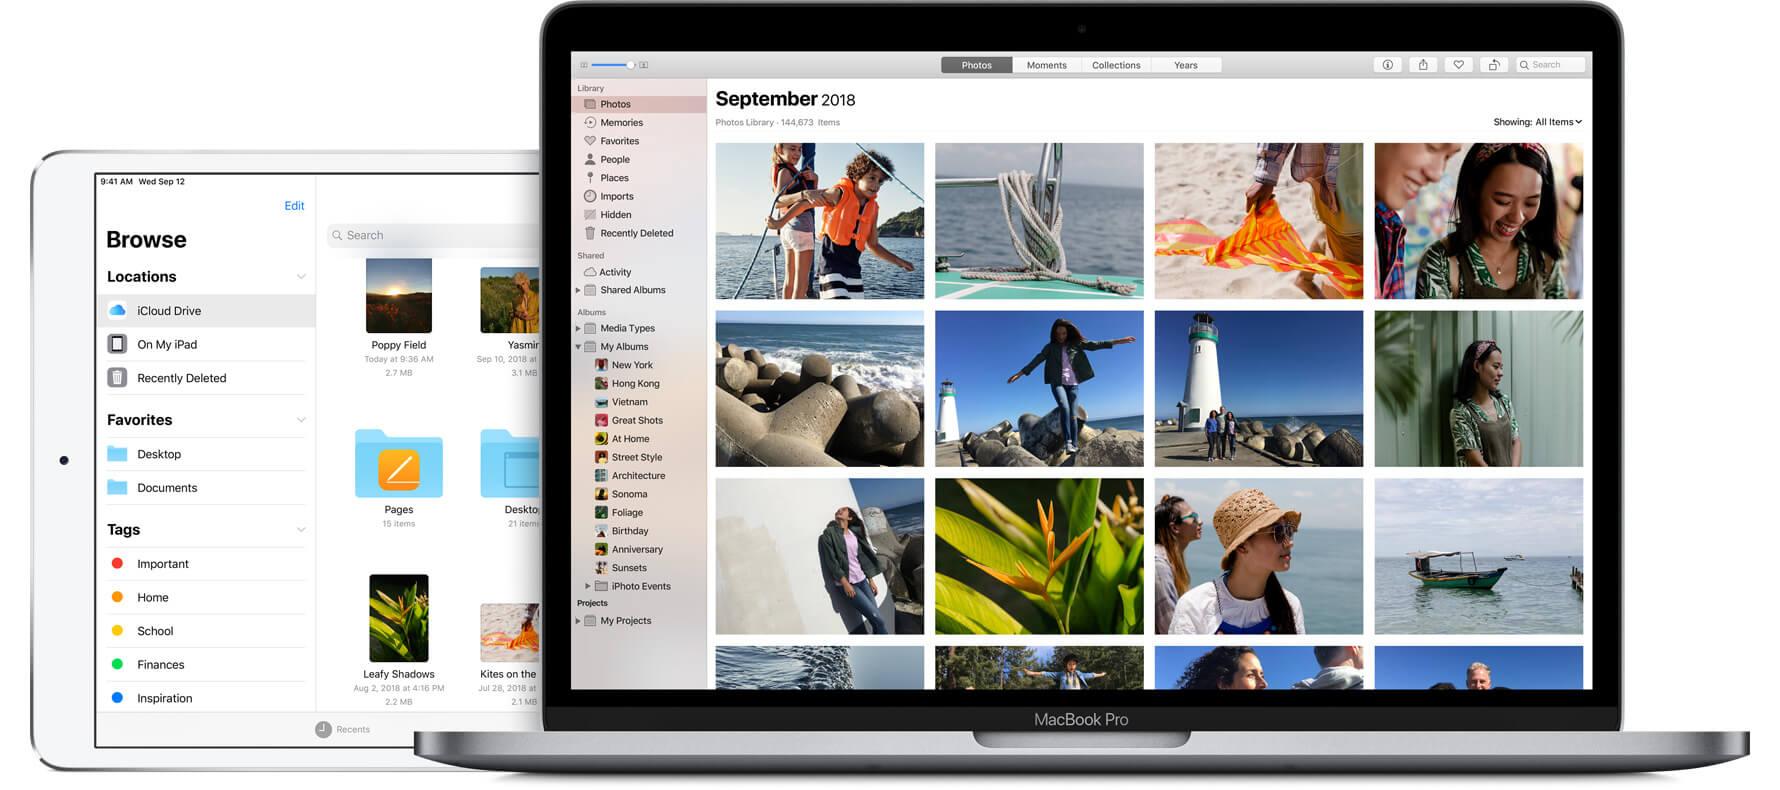 iCloud Drive Image